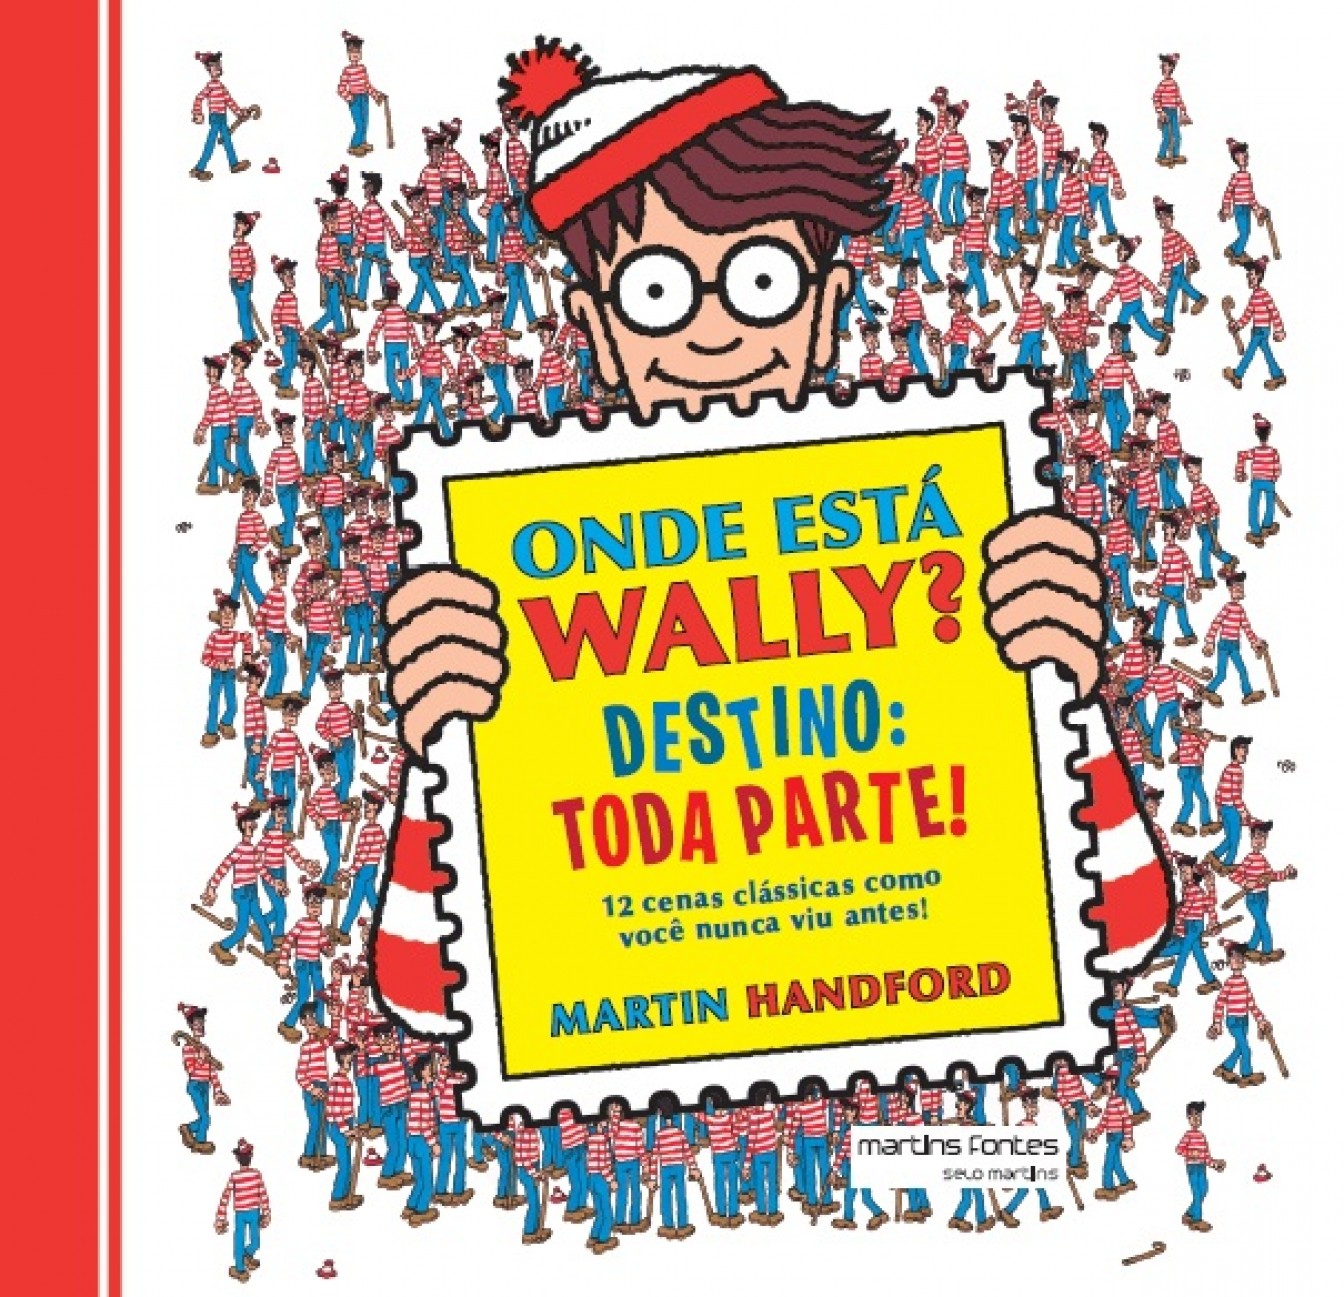 Onde está Wally? - destino: toda parte!, livro de Martin Hanford